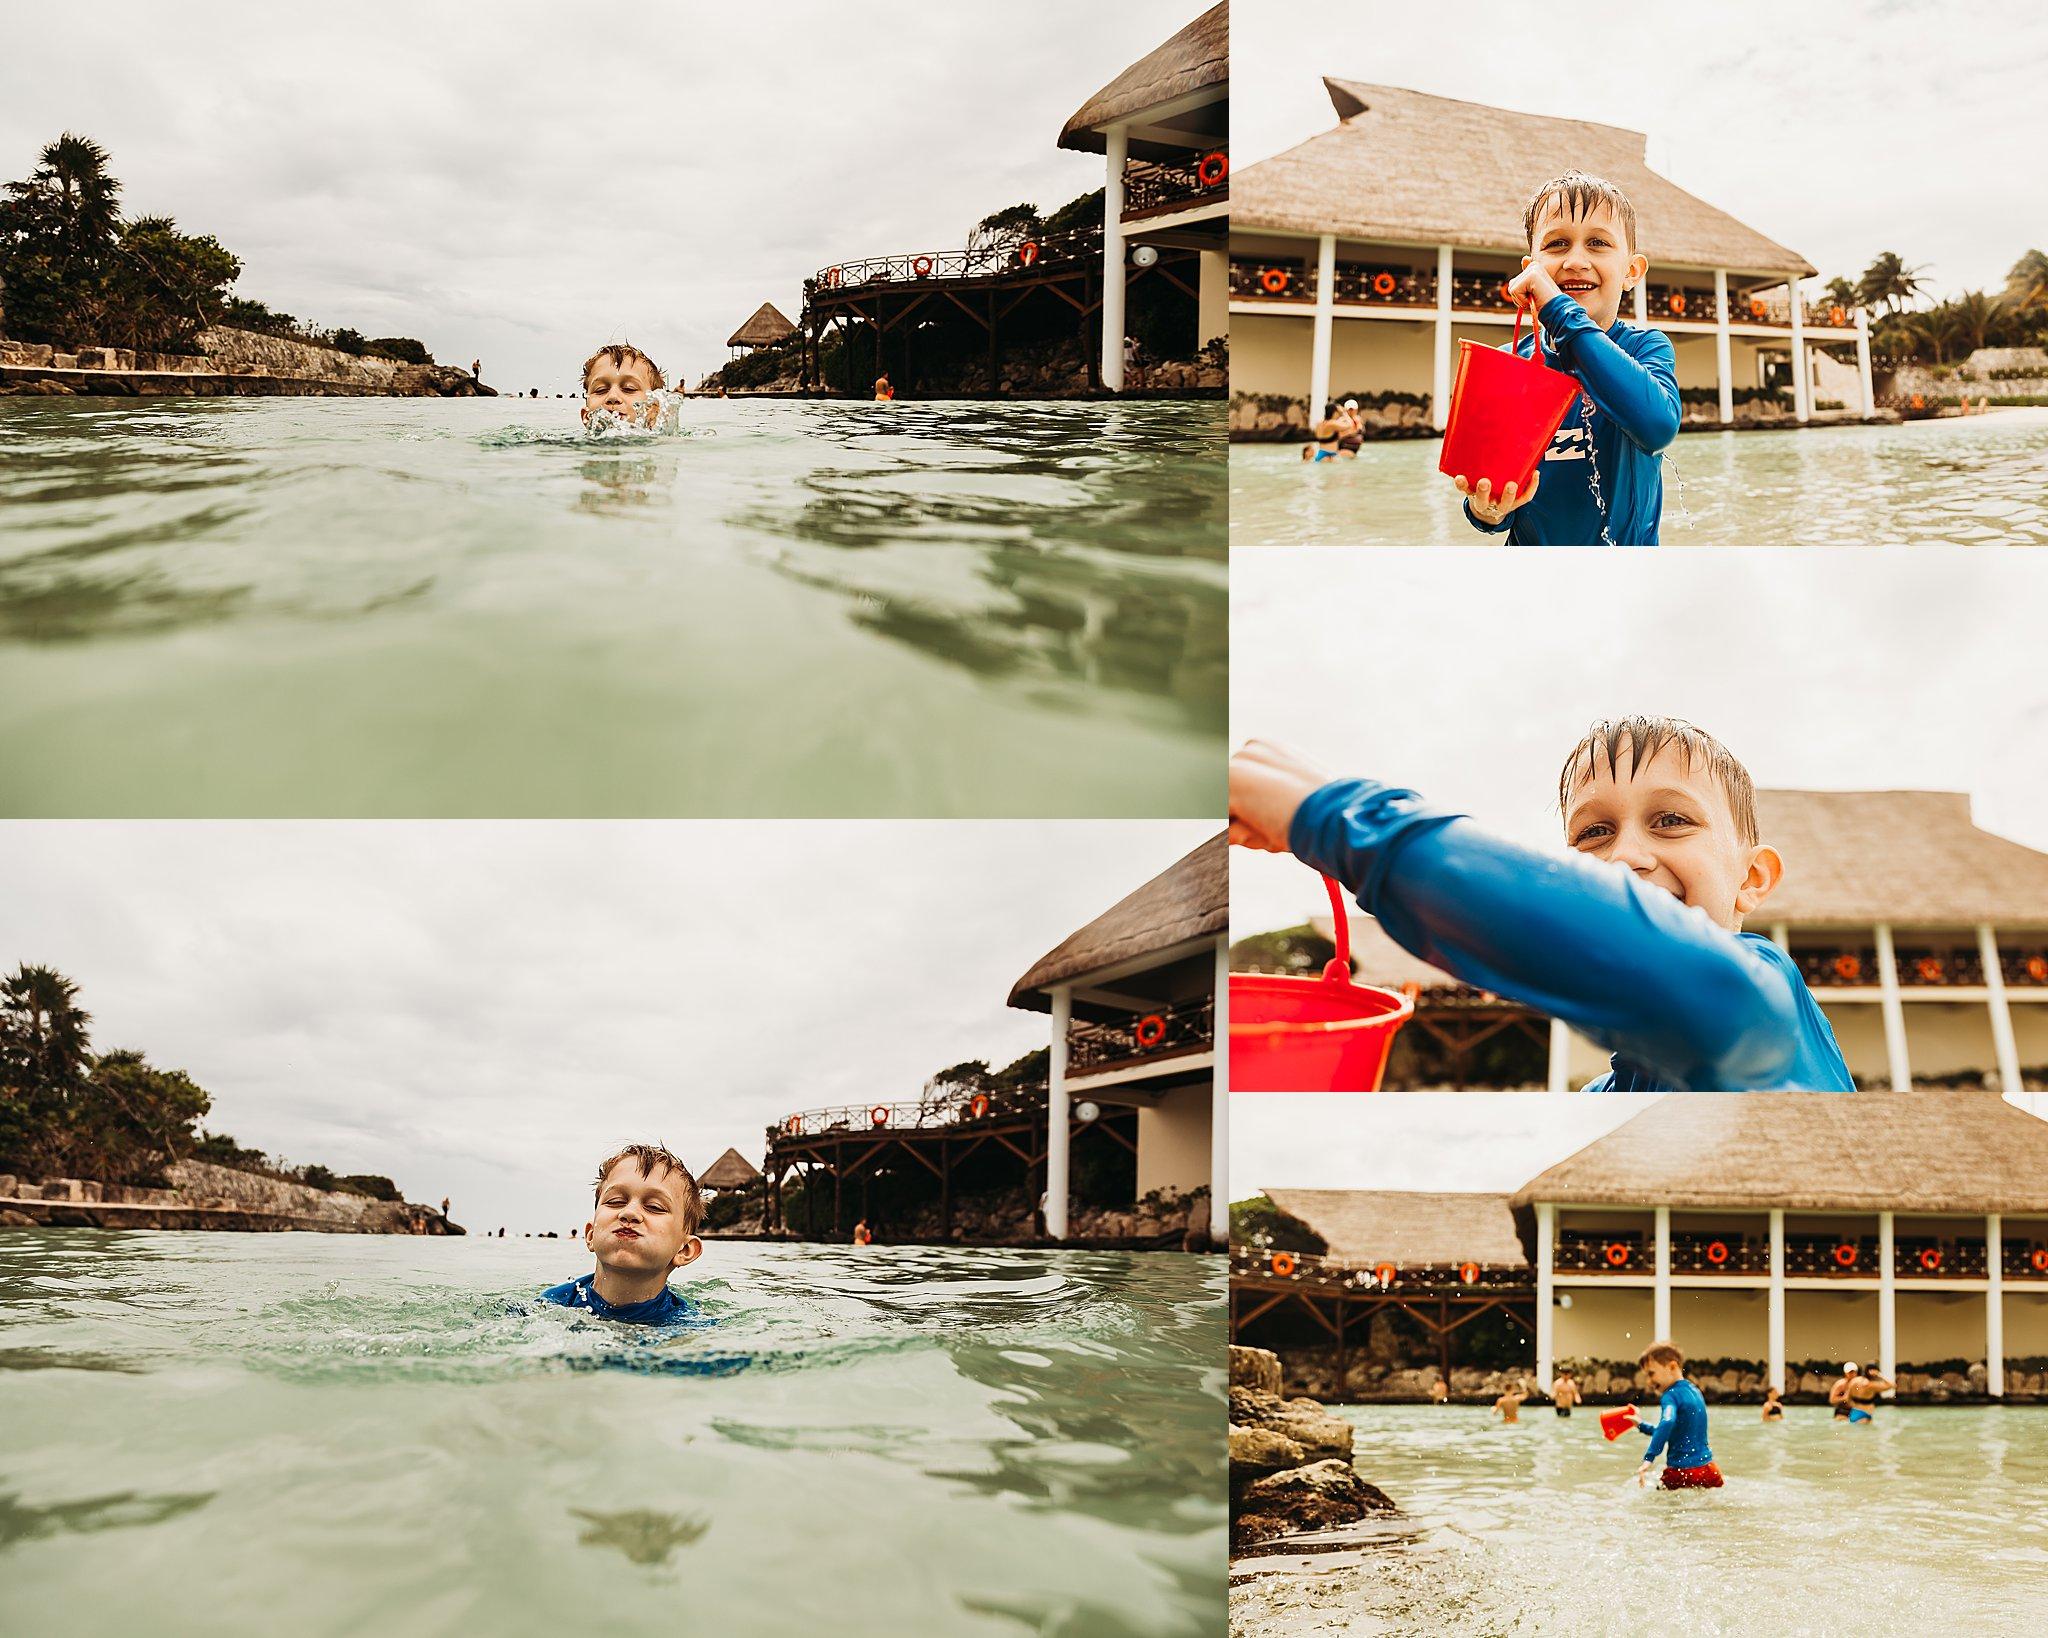 Mexico Vacation 2019 Anna Hurley Photography 44.jpg